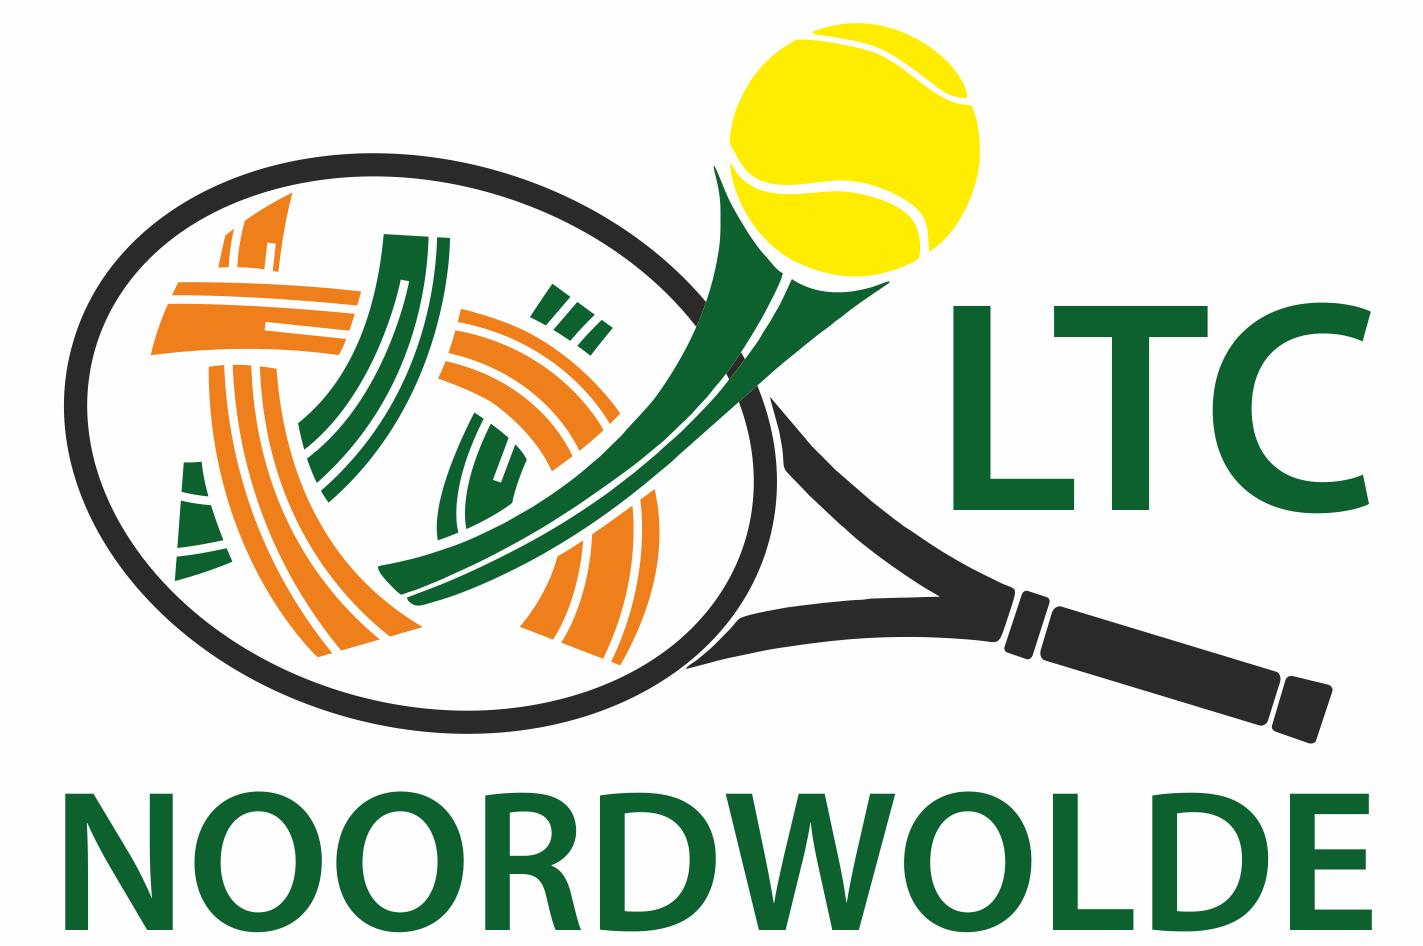 L.T.C. Noordwolde